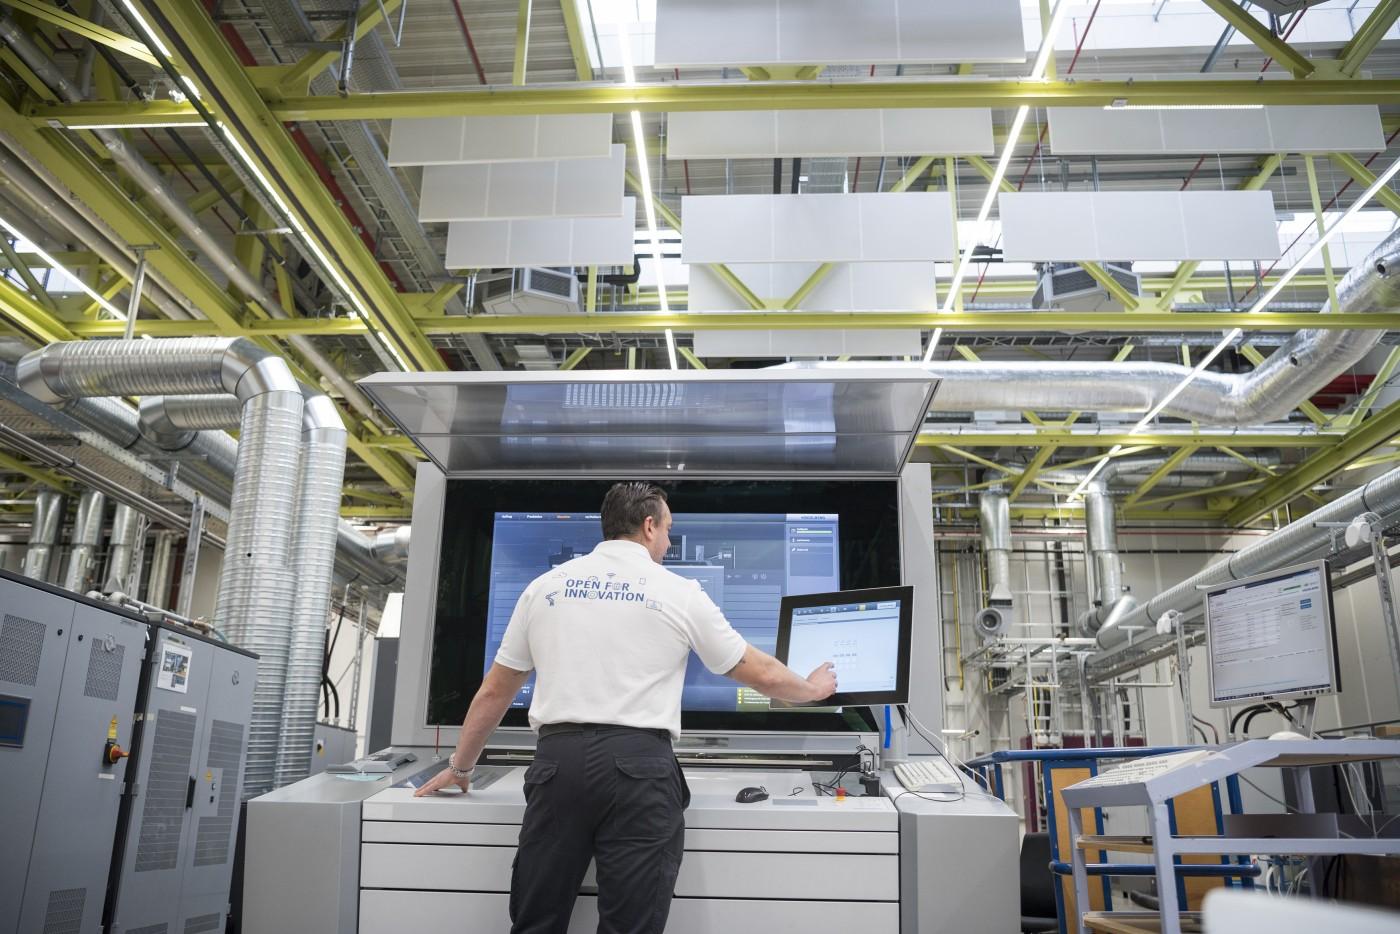 20181213_2_Heidelberg_Innovation_Center_Test_area_Digital_Printing